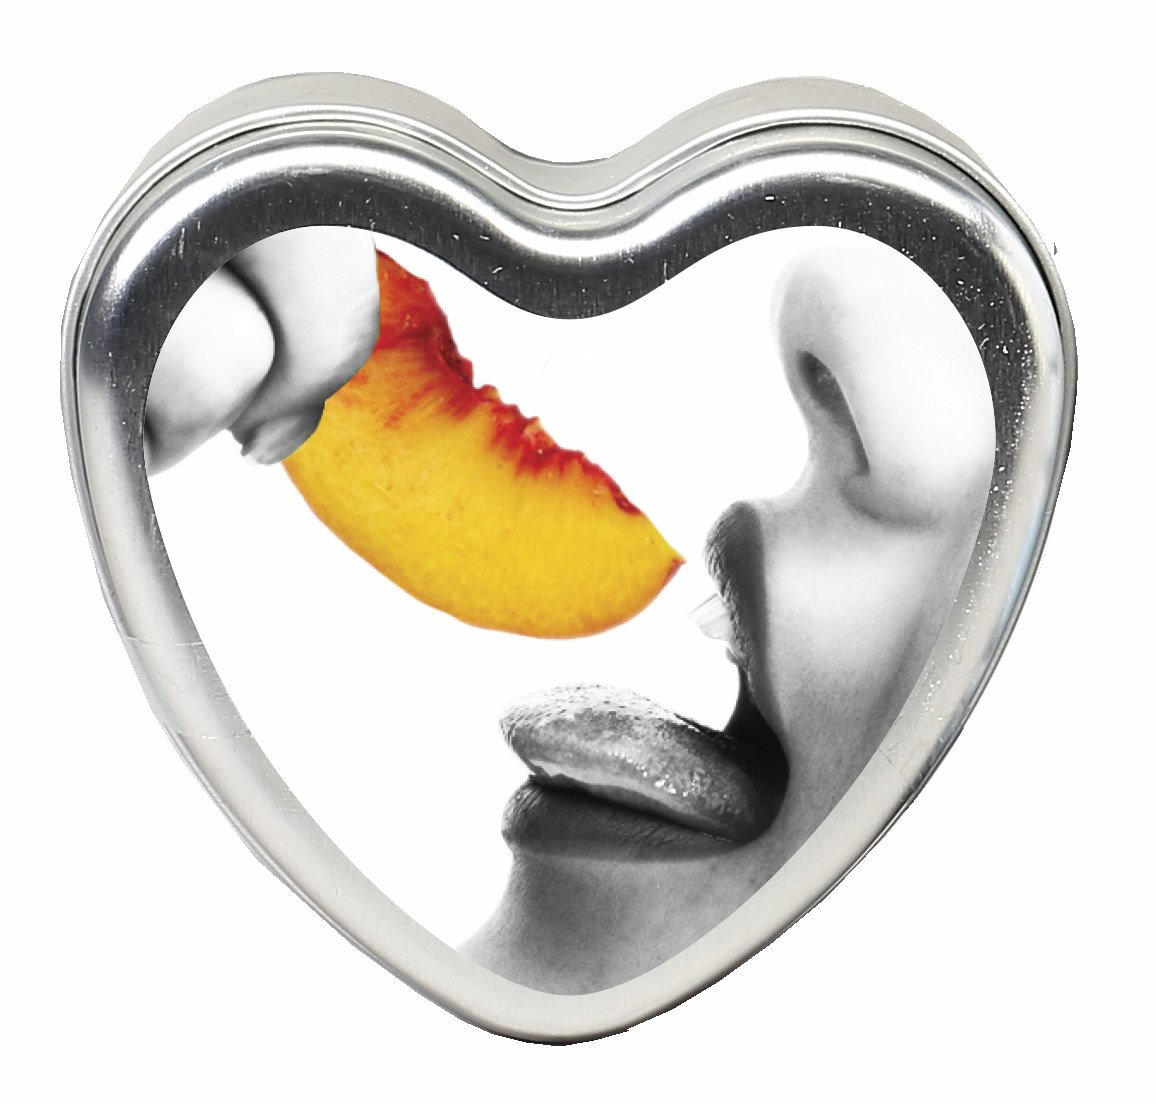 CANDLE 3-IN-1 HEART EDIBLE PEACH 4.7 OZ.  - EBHSCK006